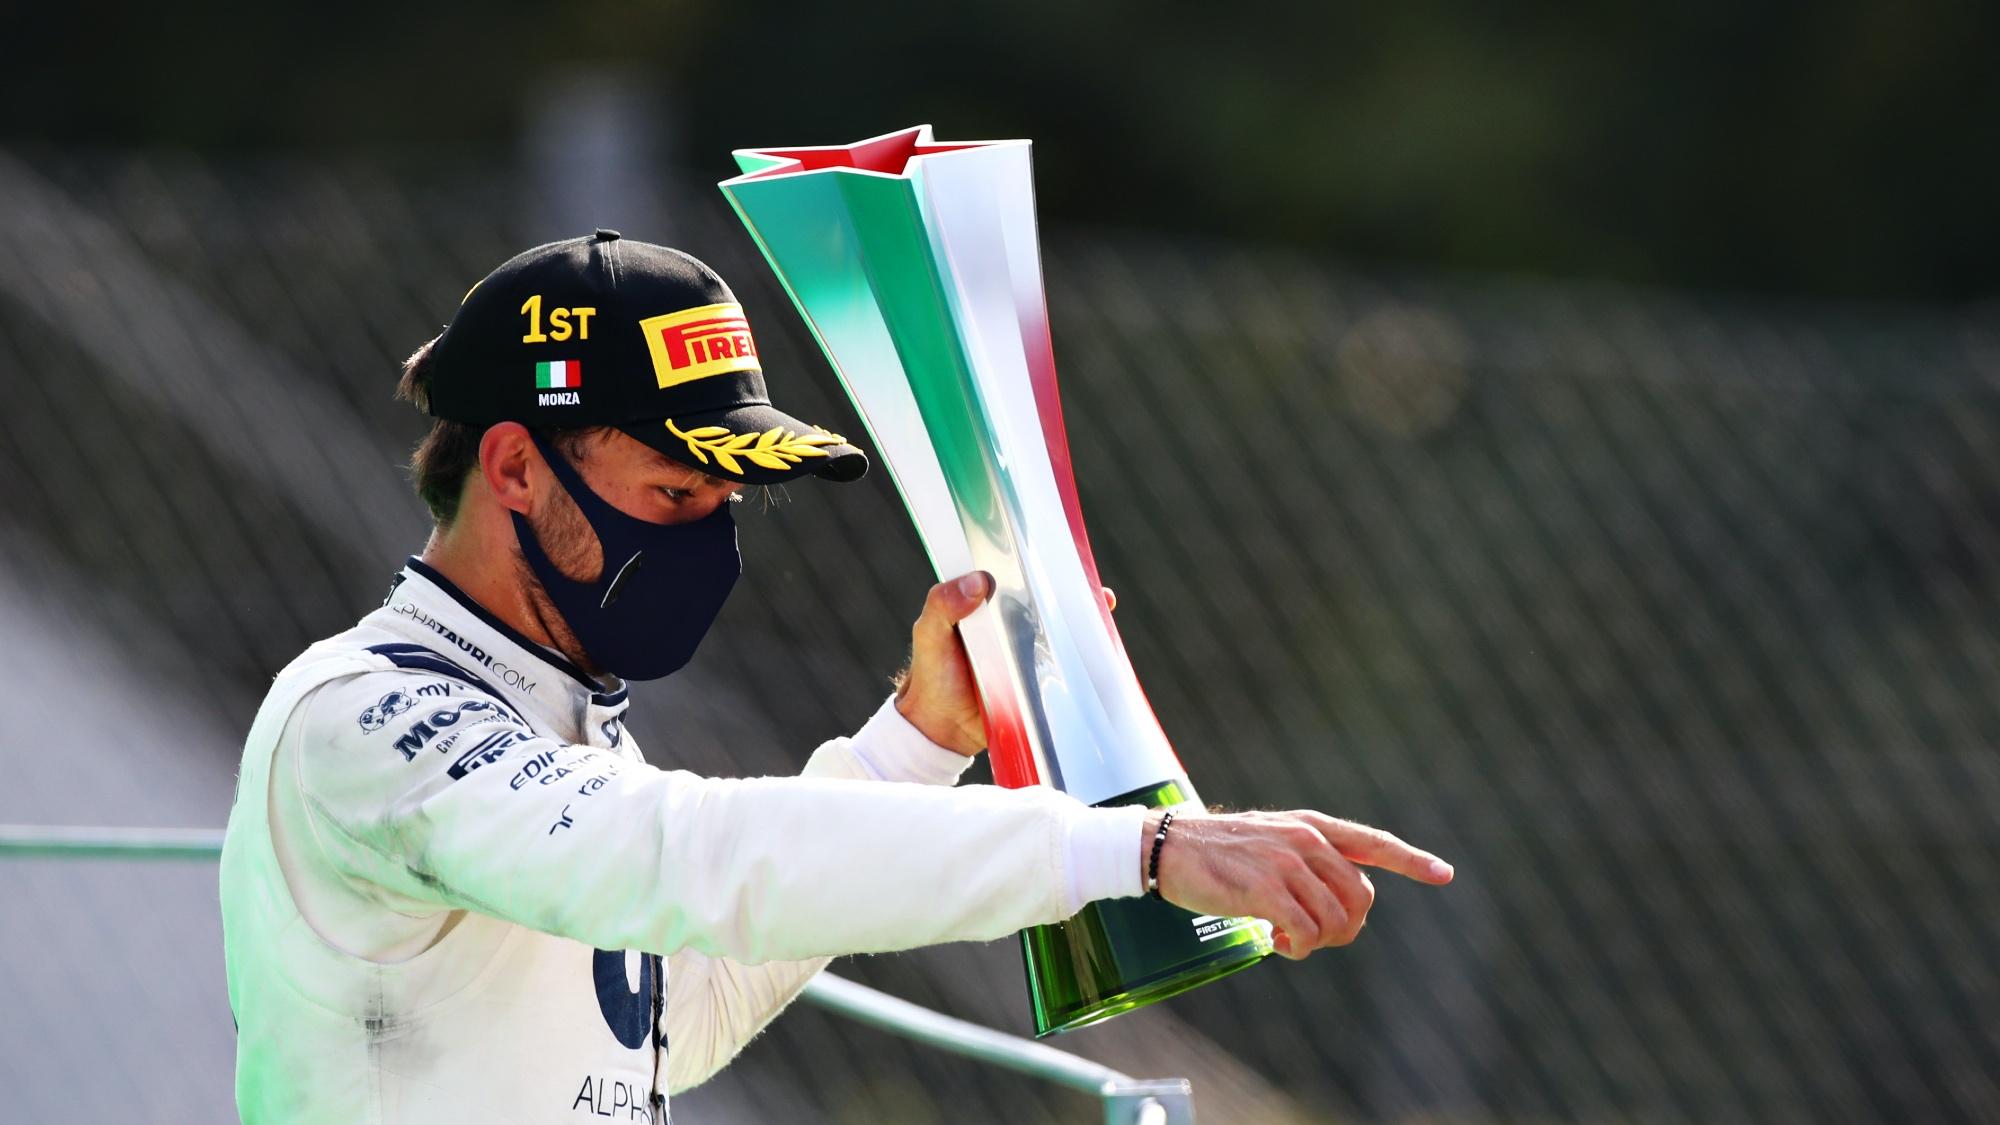 Pierre Gasly, 2020 Italian GP